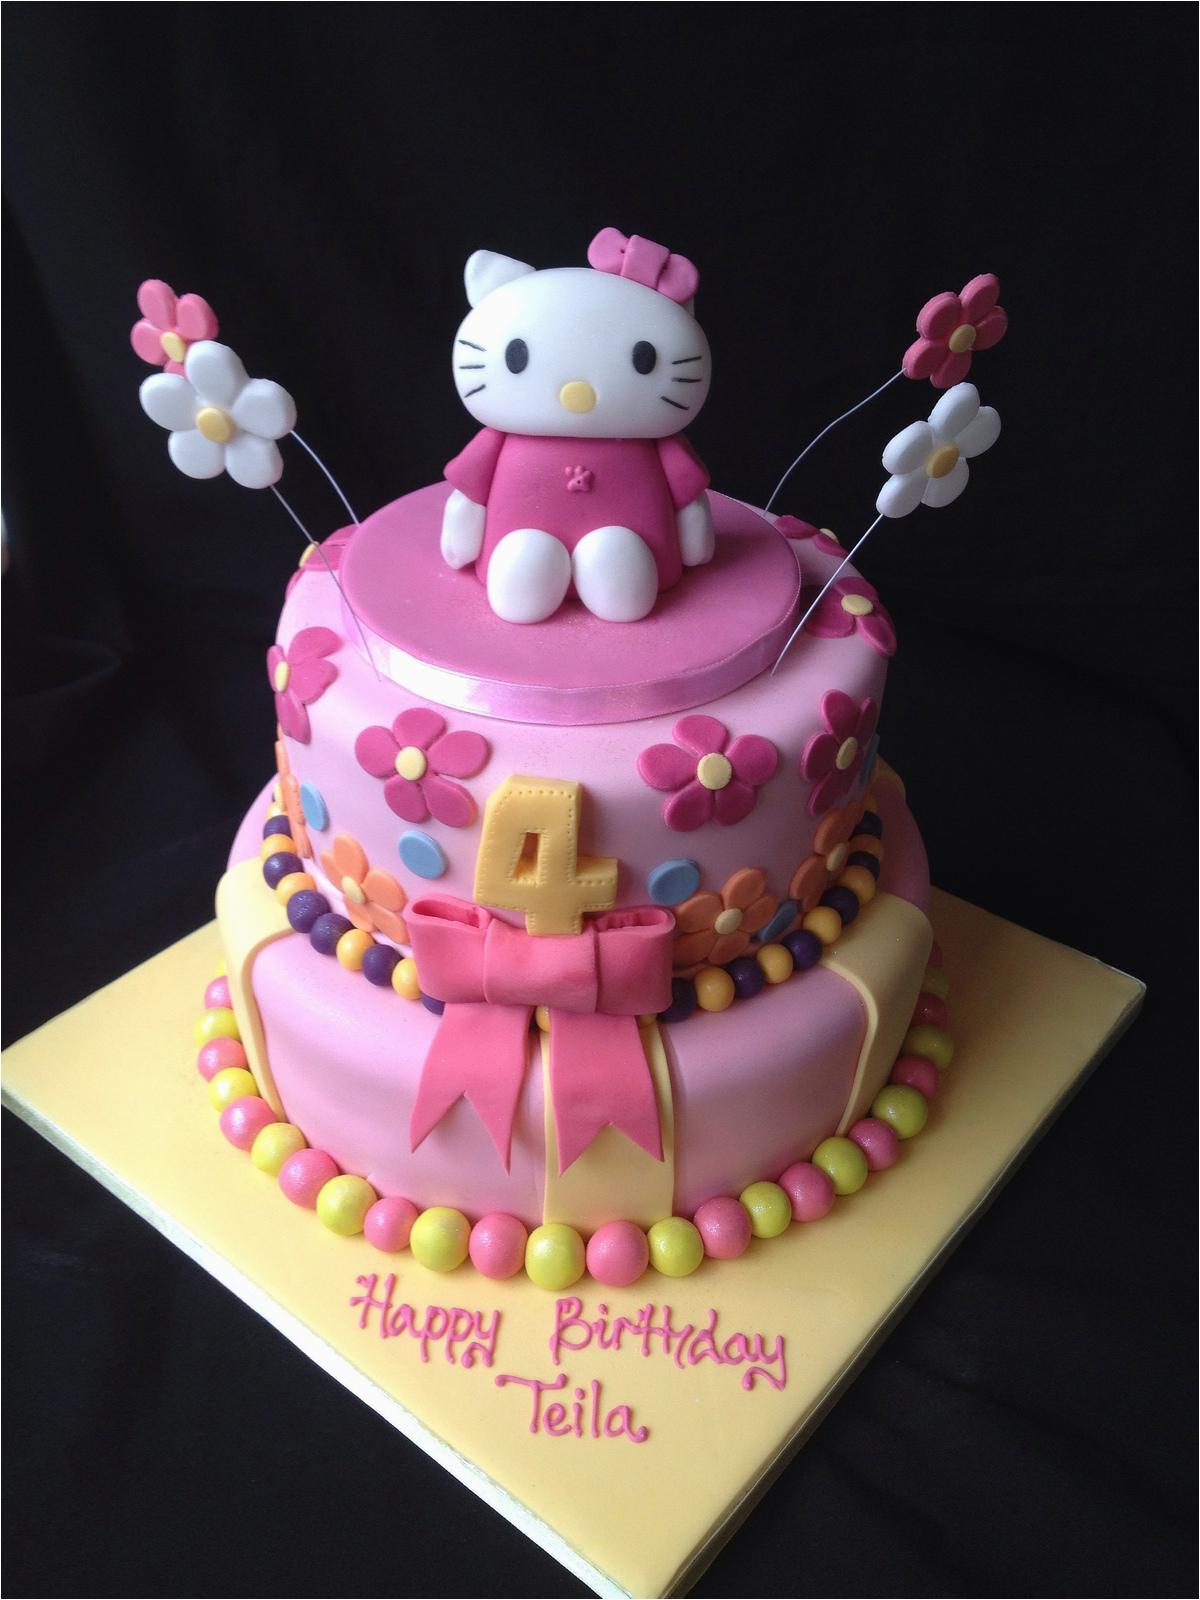 Surprising Hello Kitty Birthday Cake Decorations The Cake Boutique Birthday Cards Printable Benkemecafe Filternl